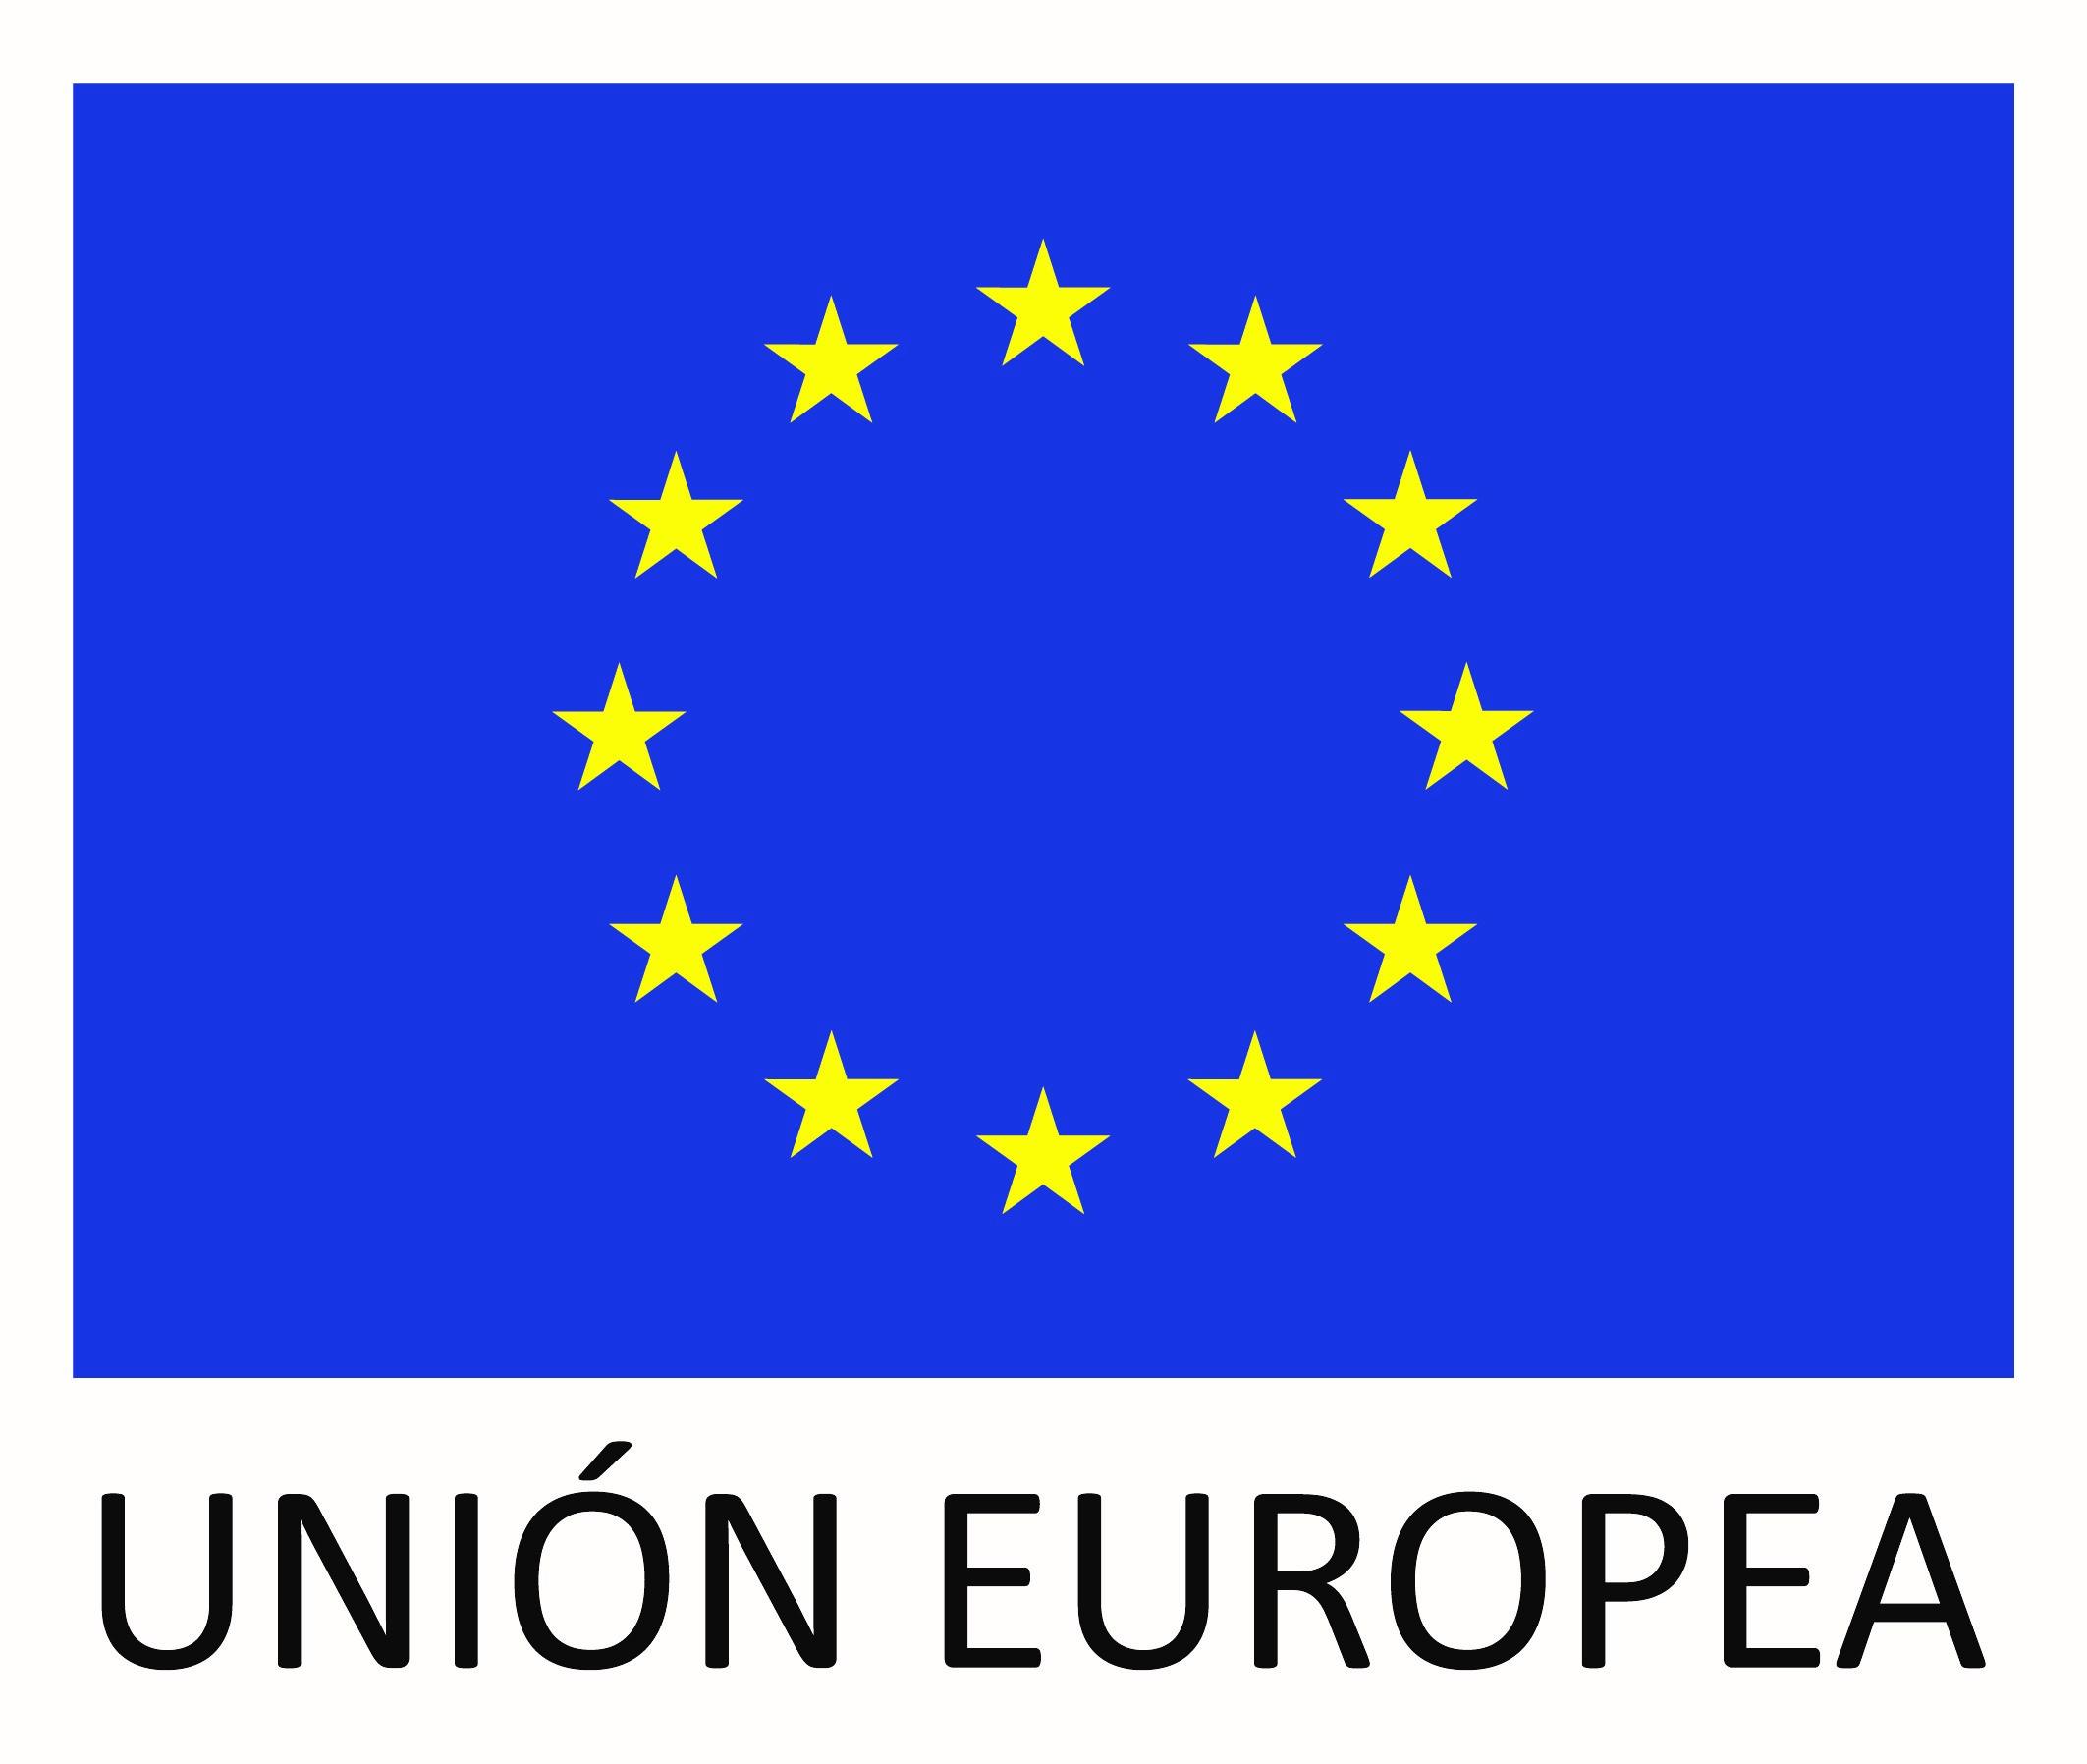 unioneuropea.jpg